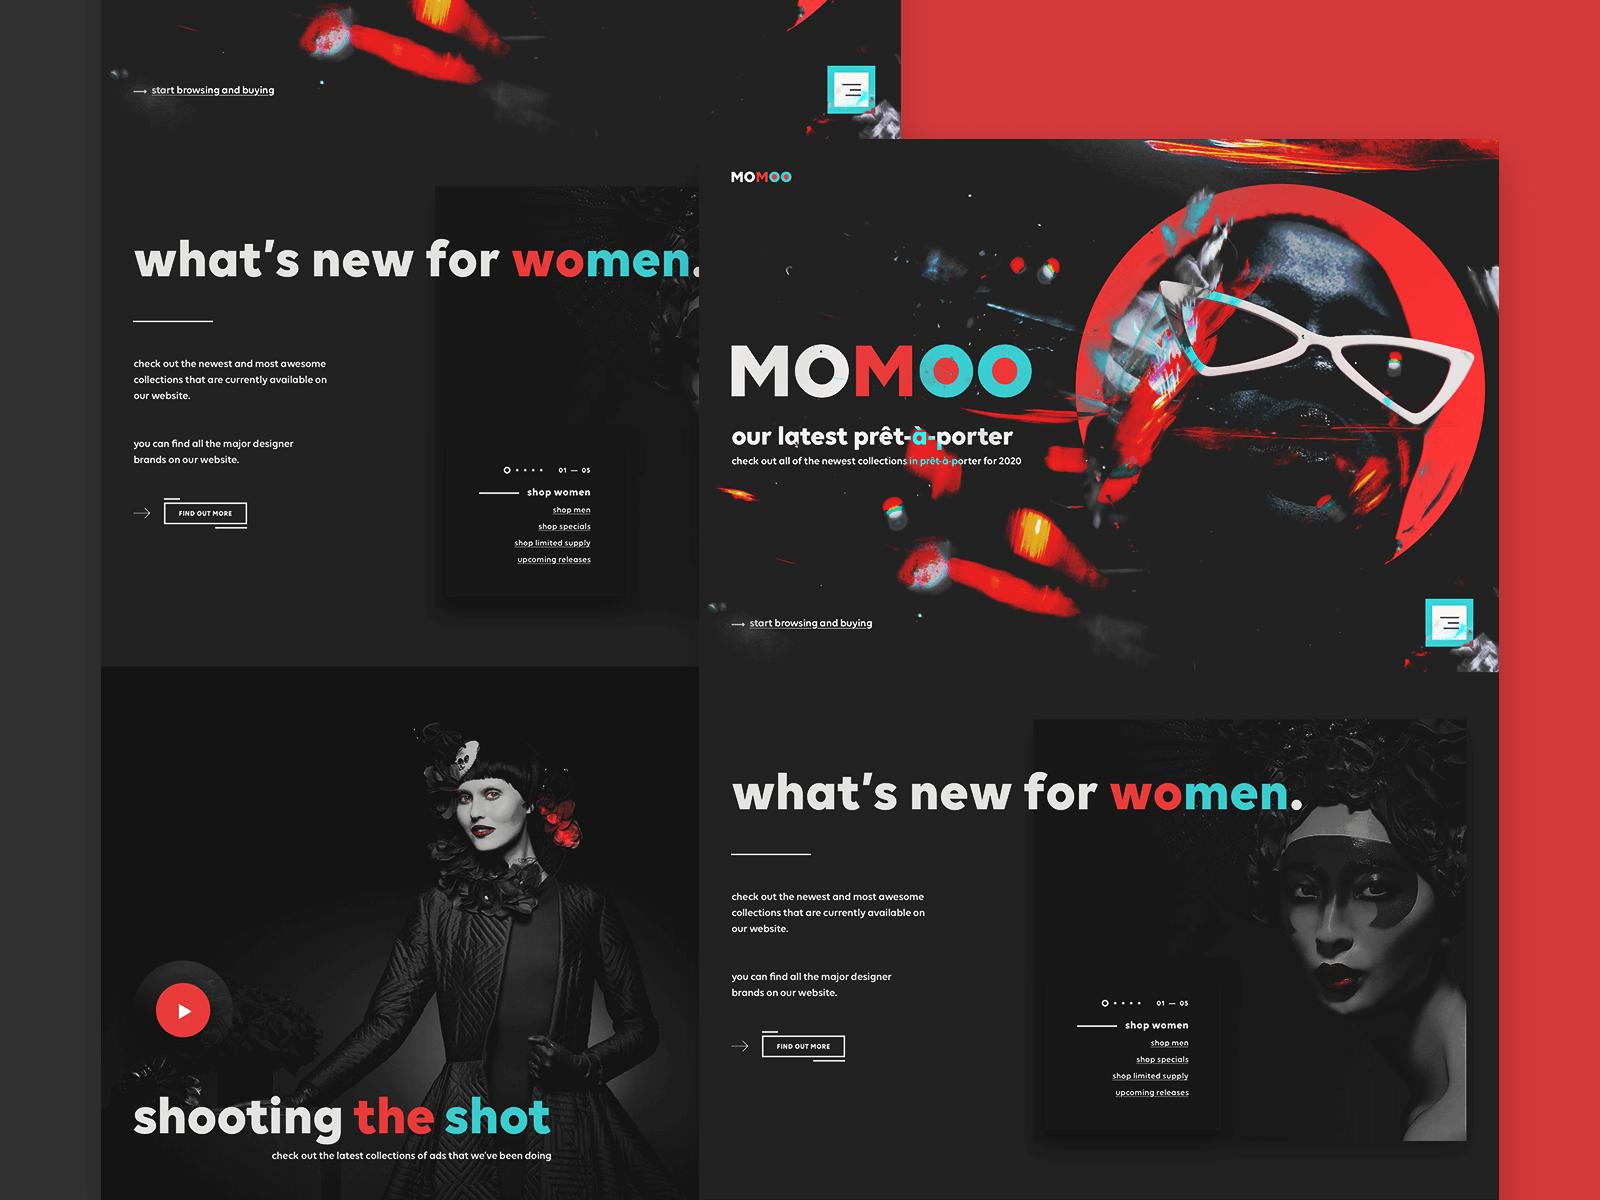 MOMOO-Online-Fashion-Store-2-2